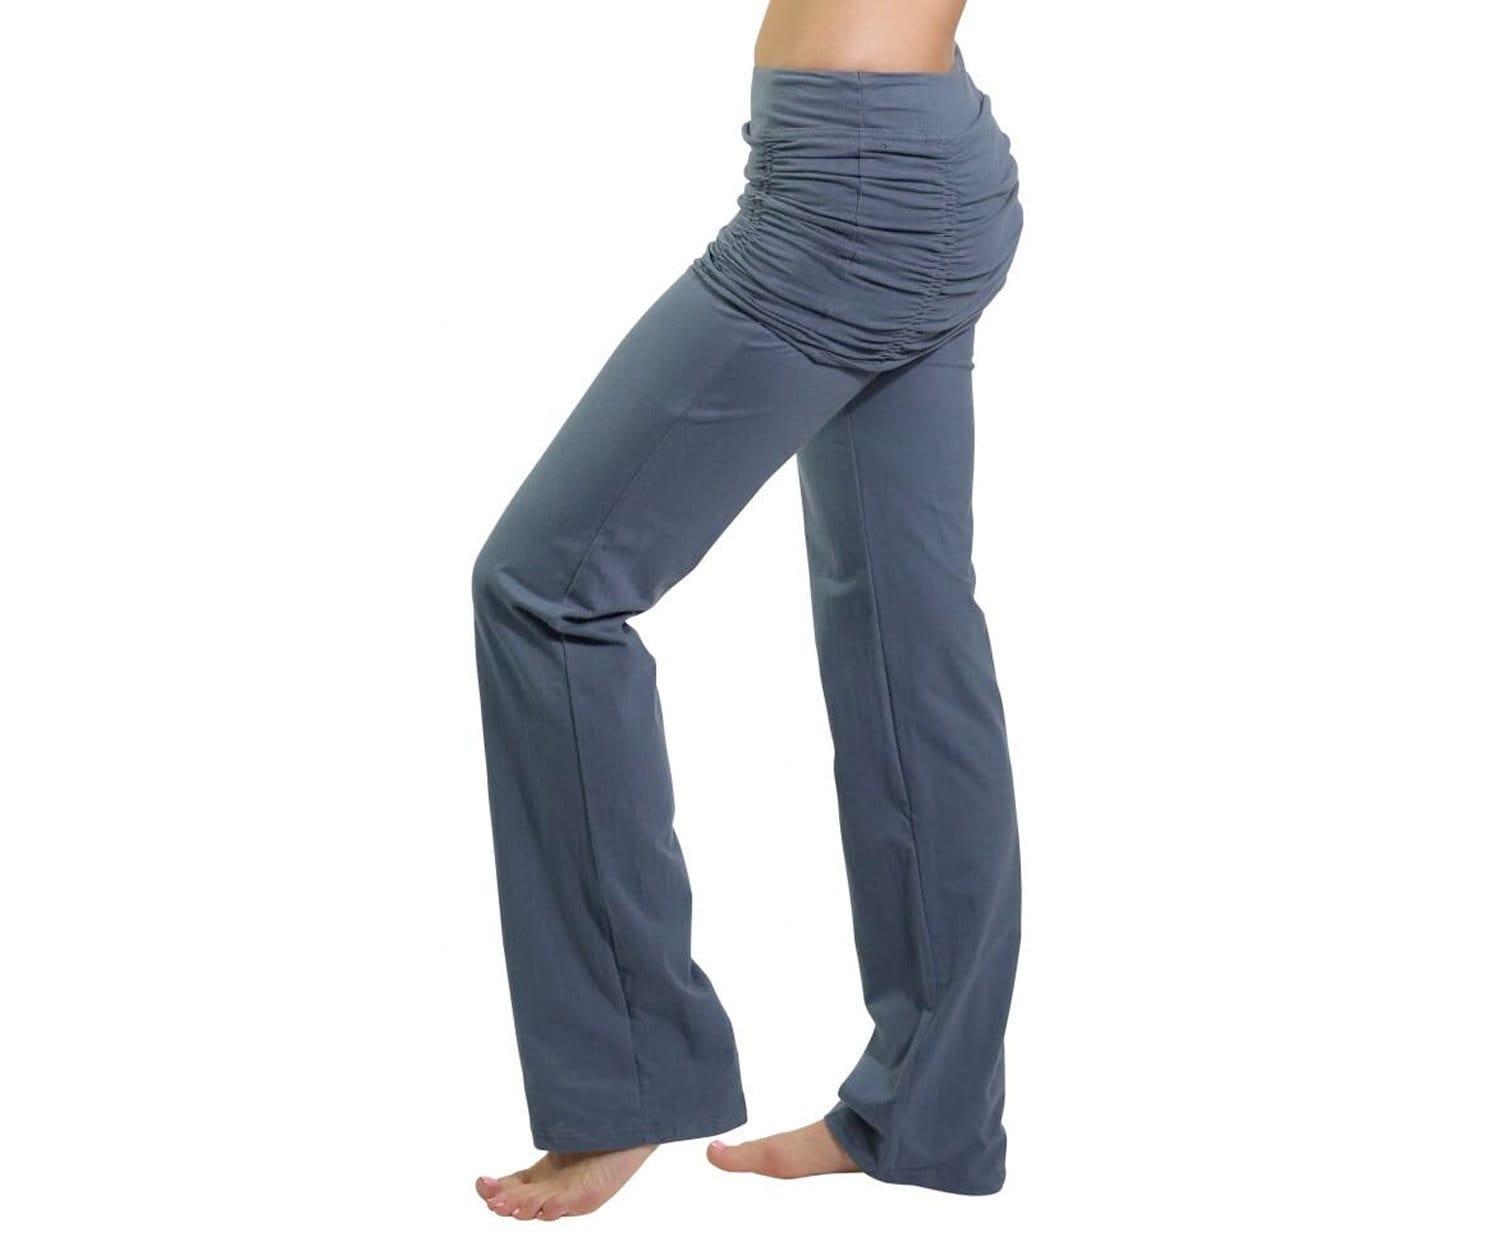 ba838835a28b4 Ruched Skirt Yoga Pants Mishu Yoga Wear Hoop Clothing | Etsy